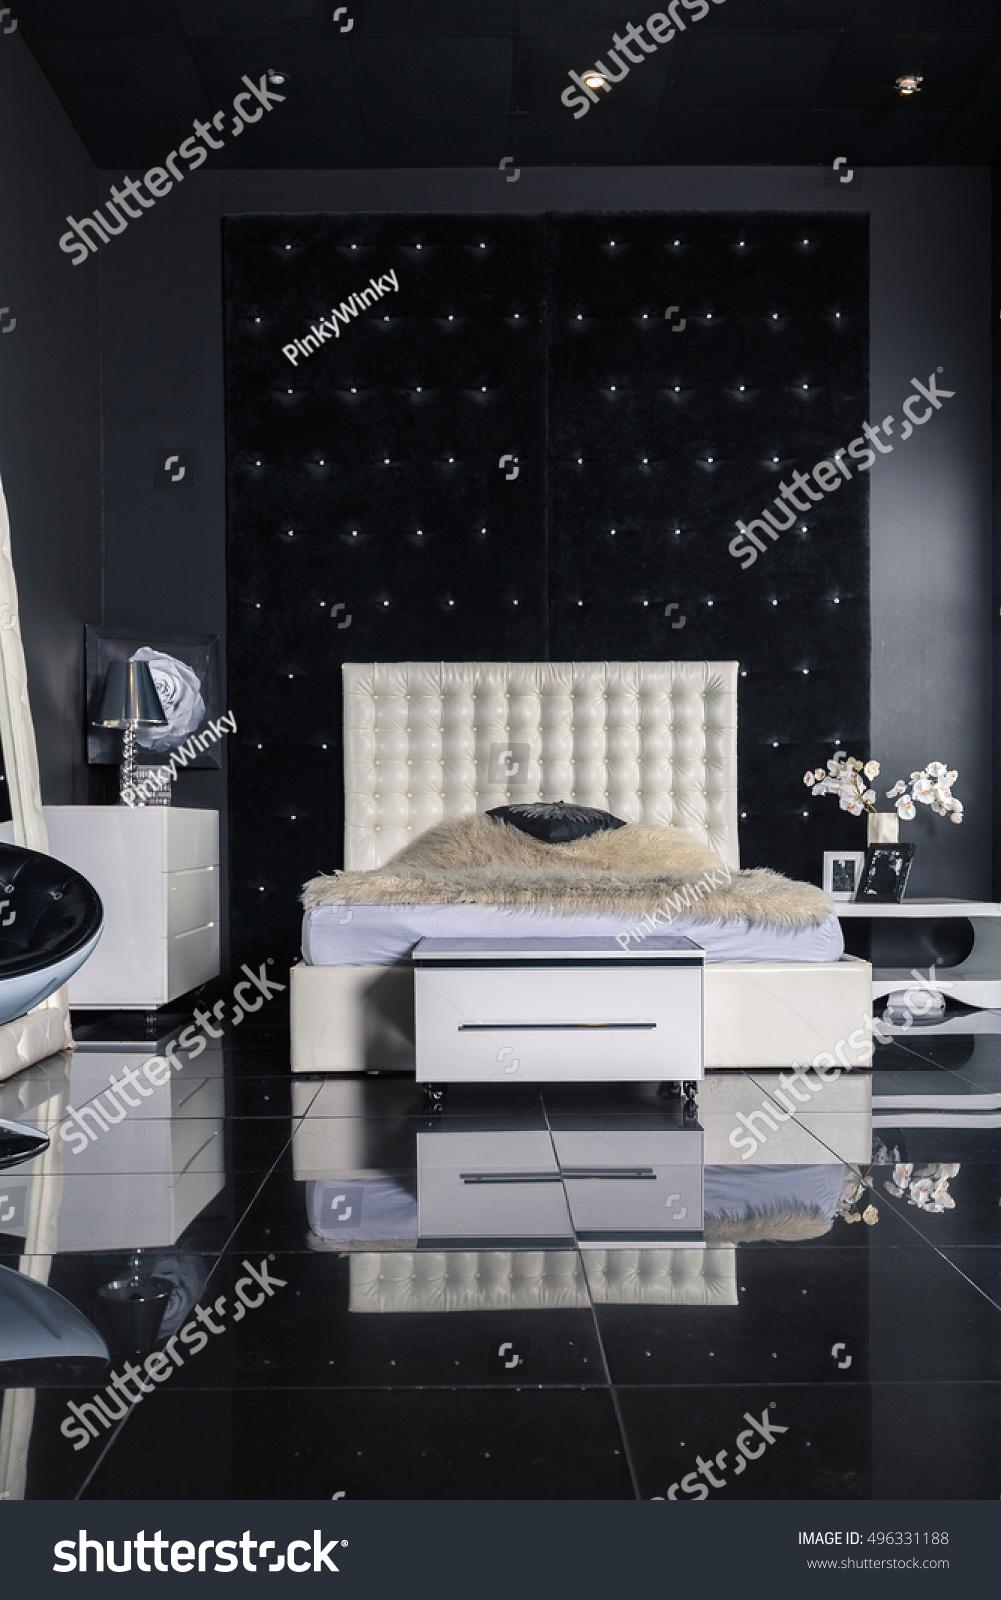 Modern Luxury Black White Interior Bedroom Stock Photo Edit Now 496331188